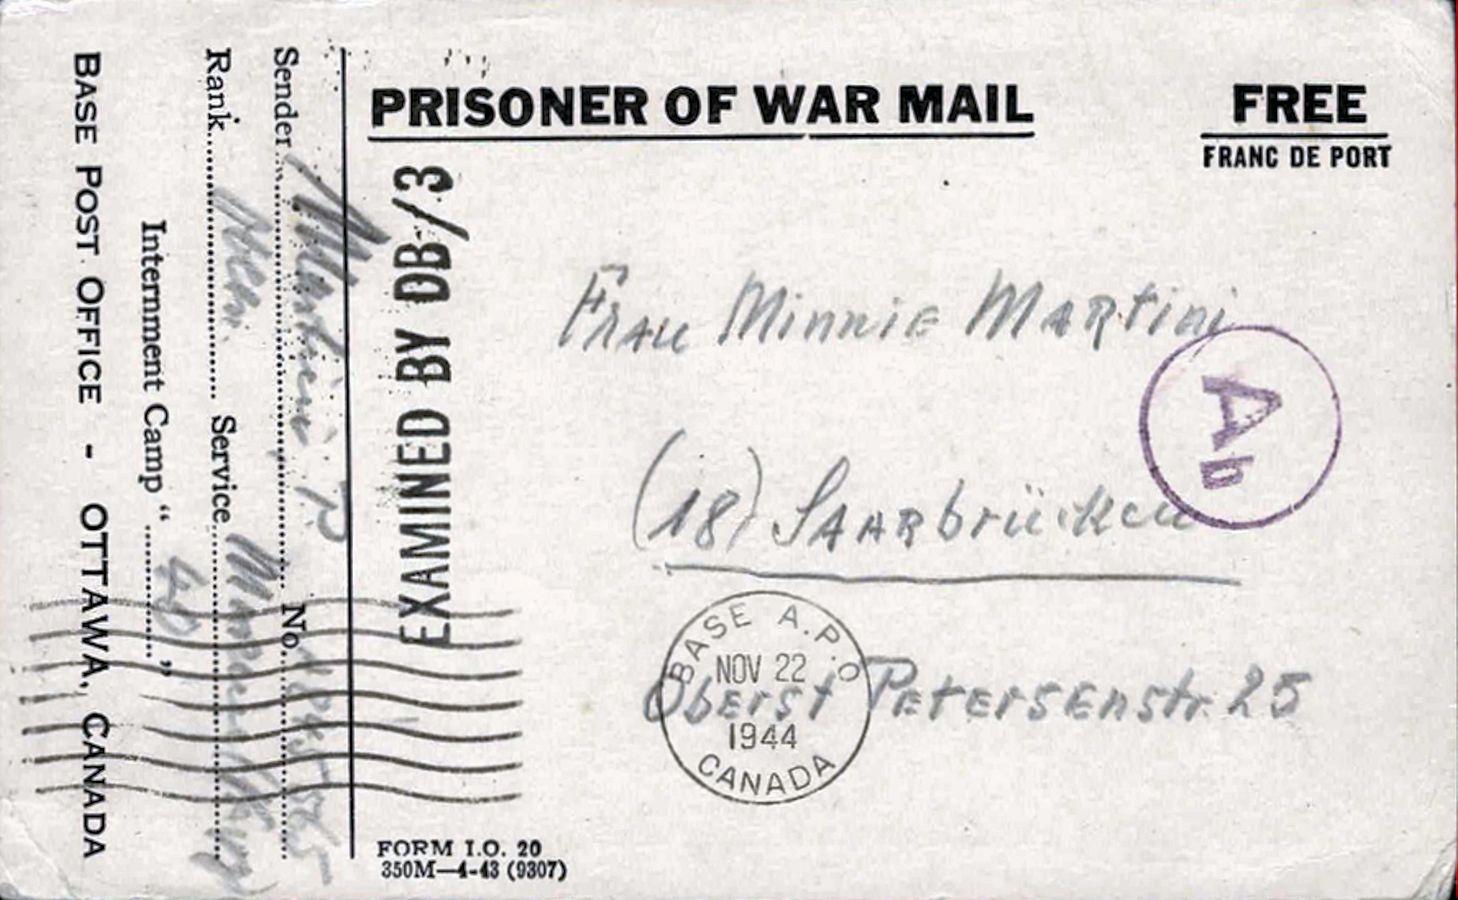 1944;Canada;The War Prisoners Aid of the YMCA ; WW II-Era Christmas POW Card